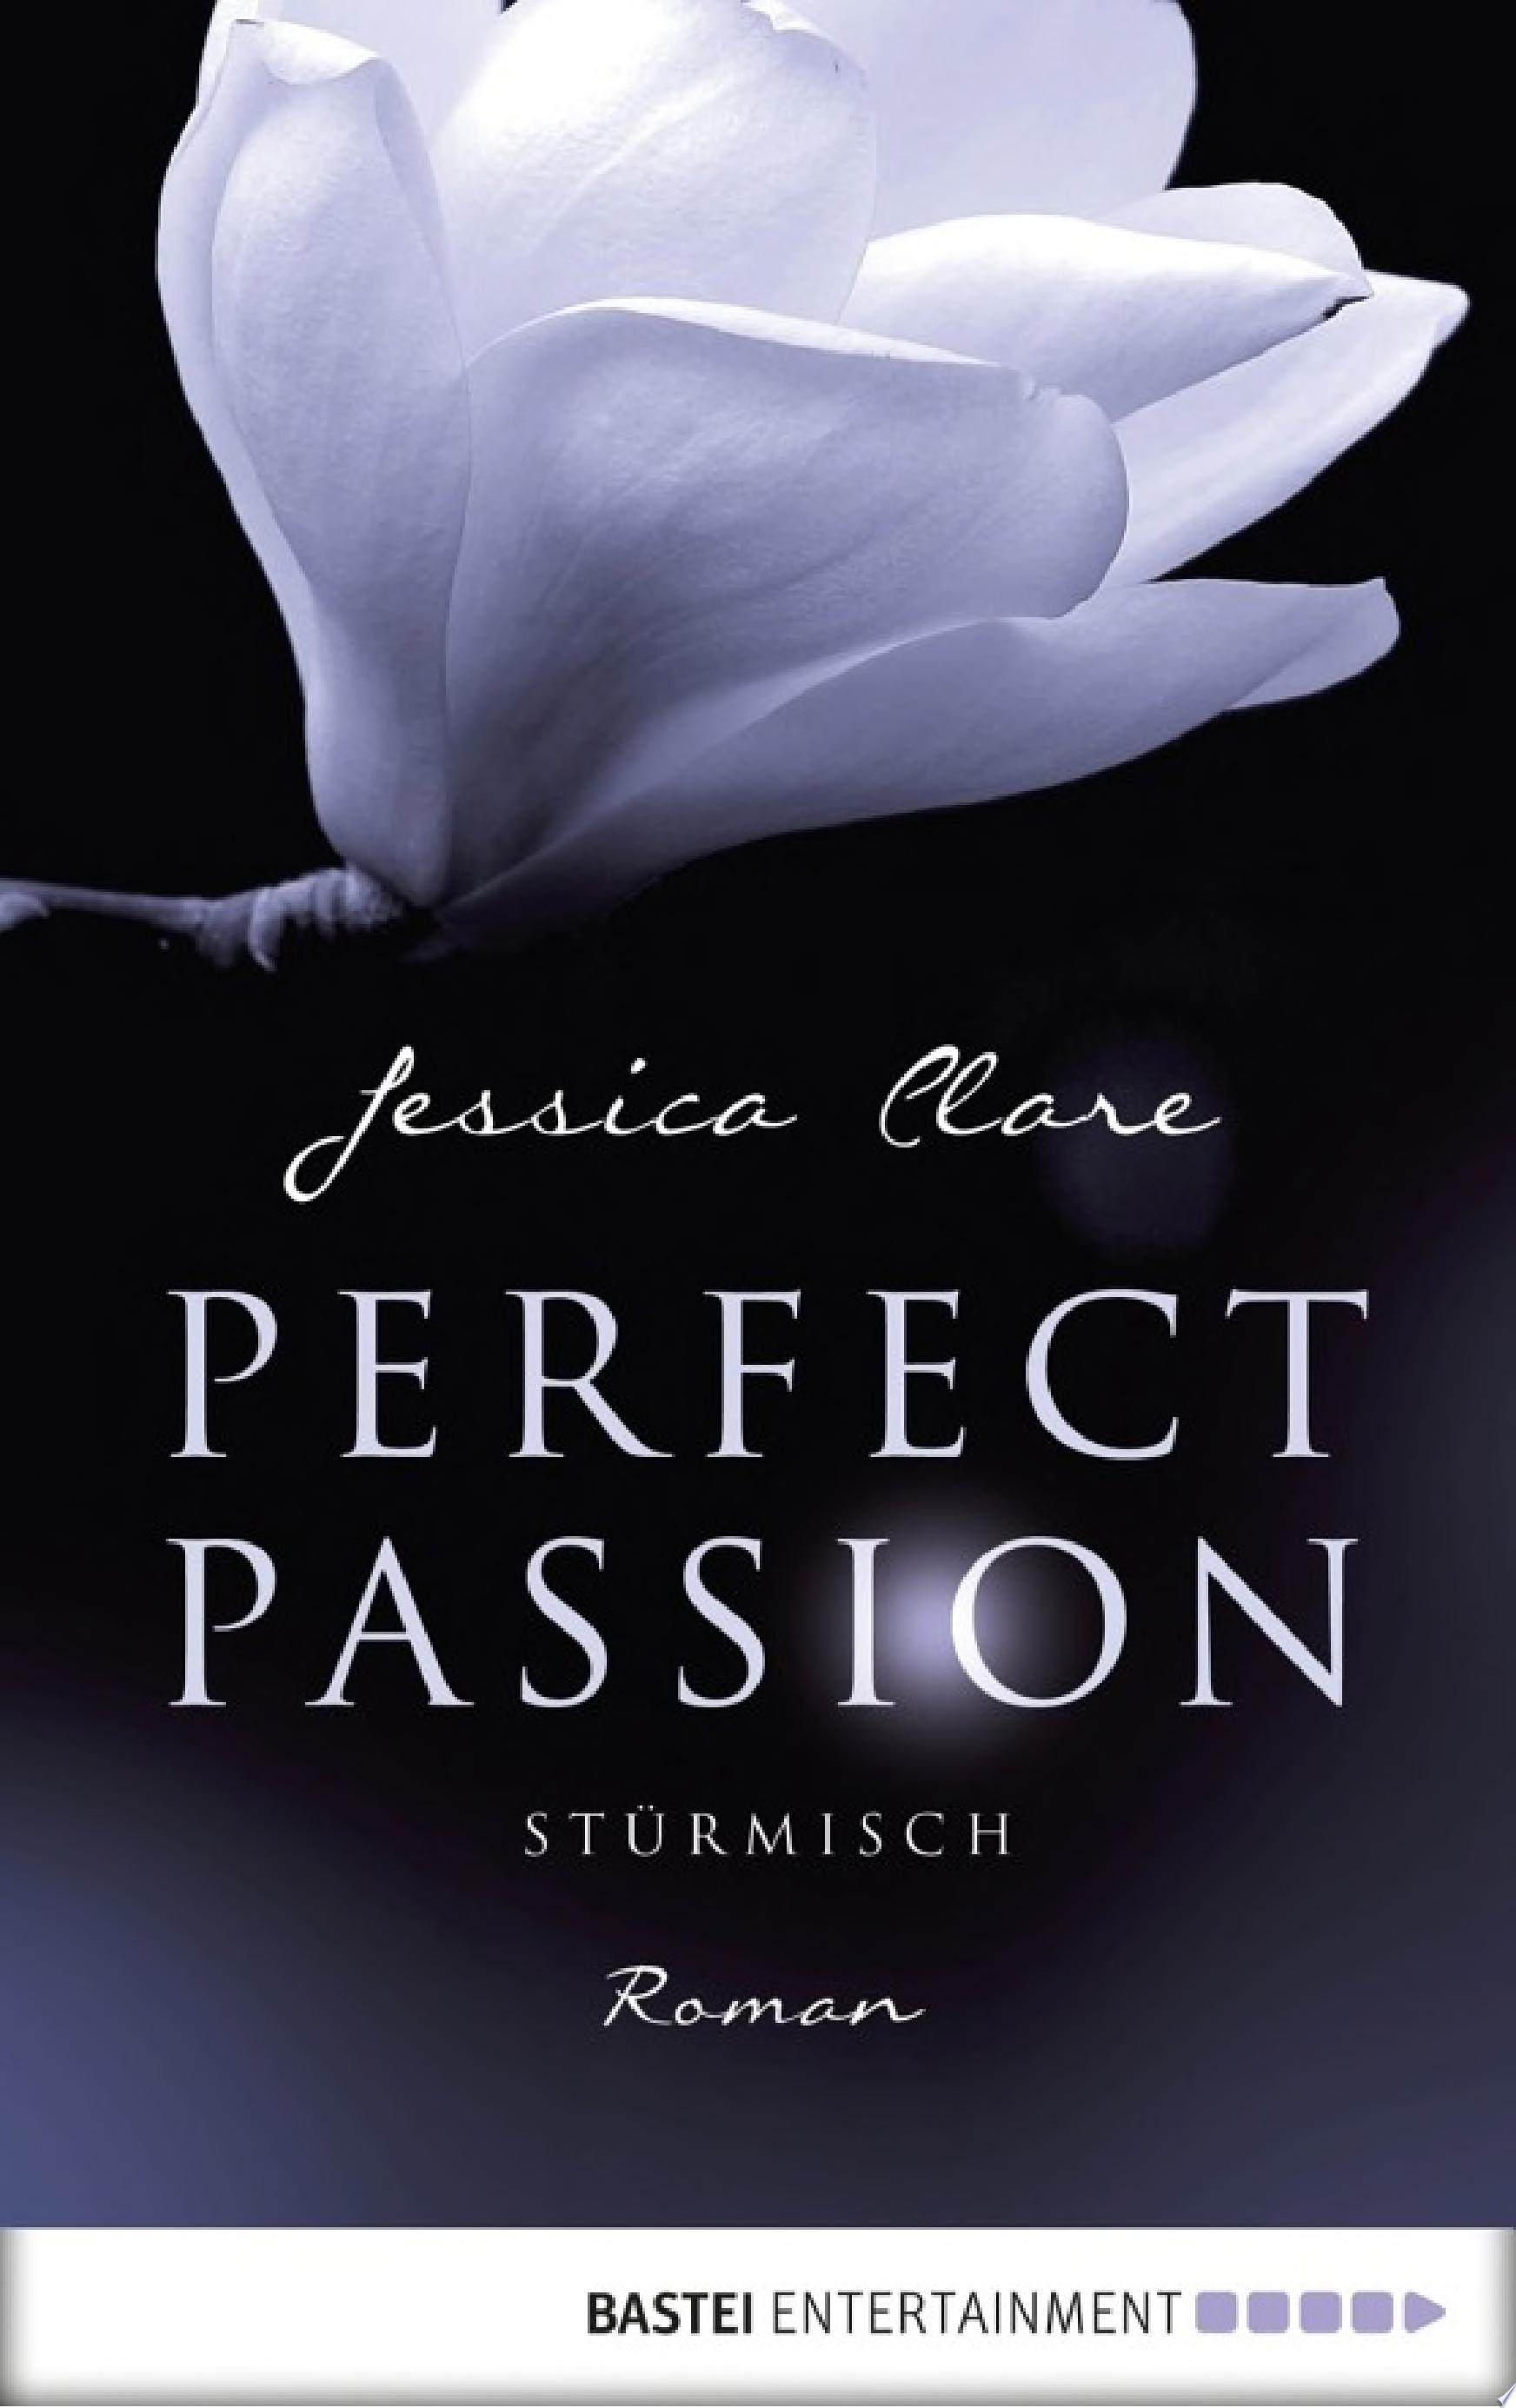 Perfect Passion   St  rmisch